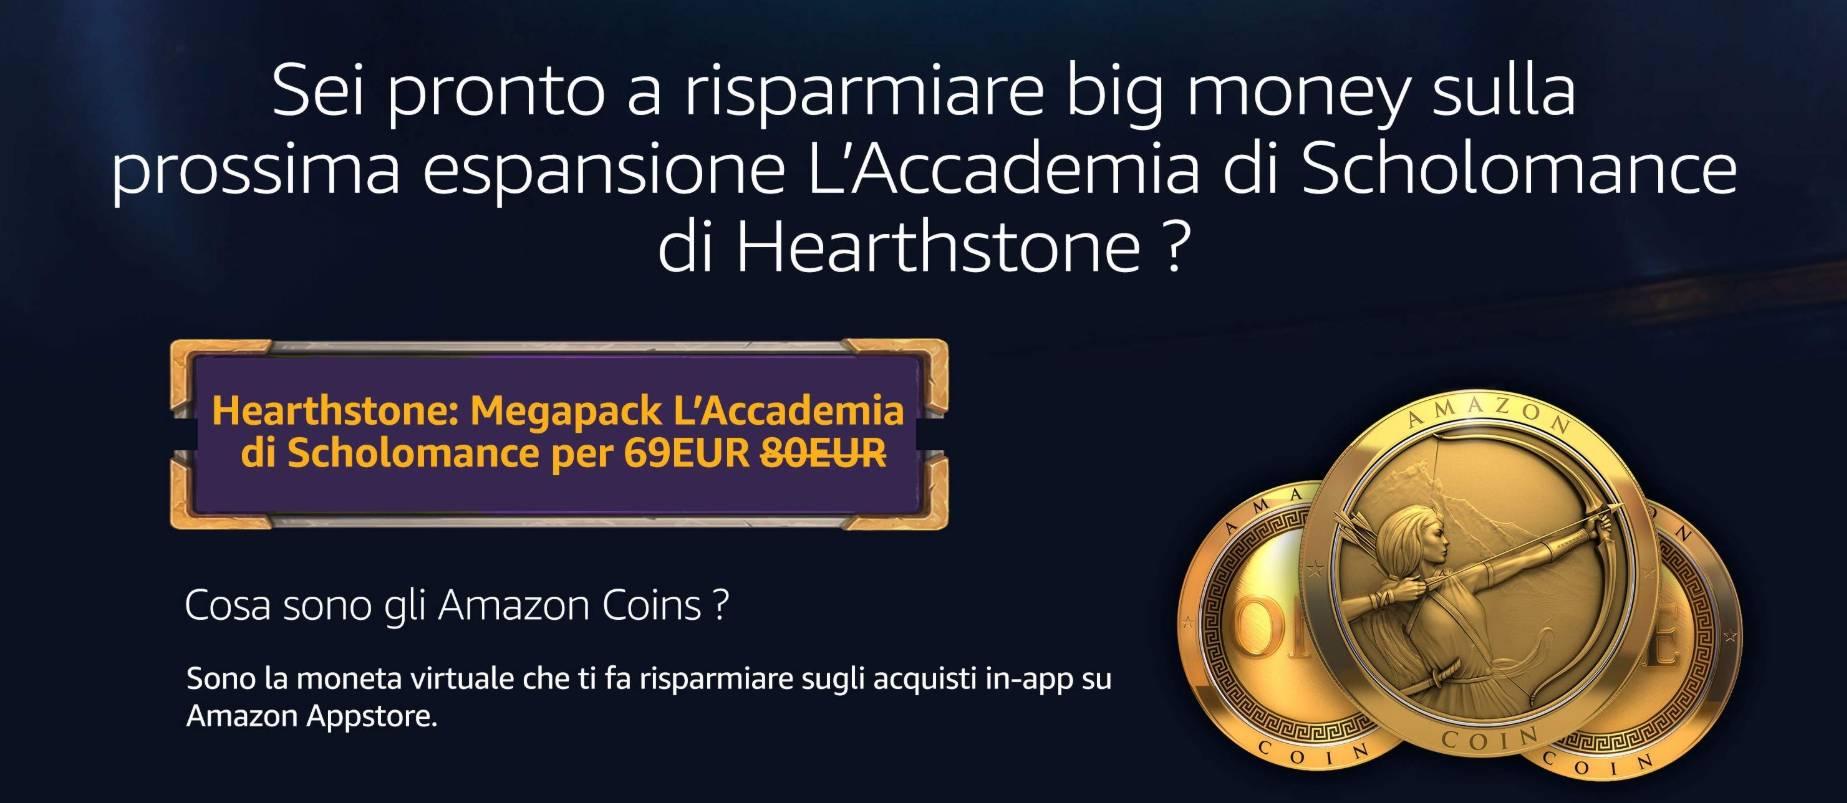 Amazon Coin Hearthstone